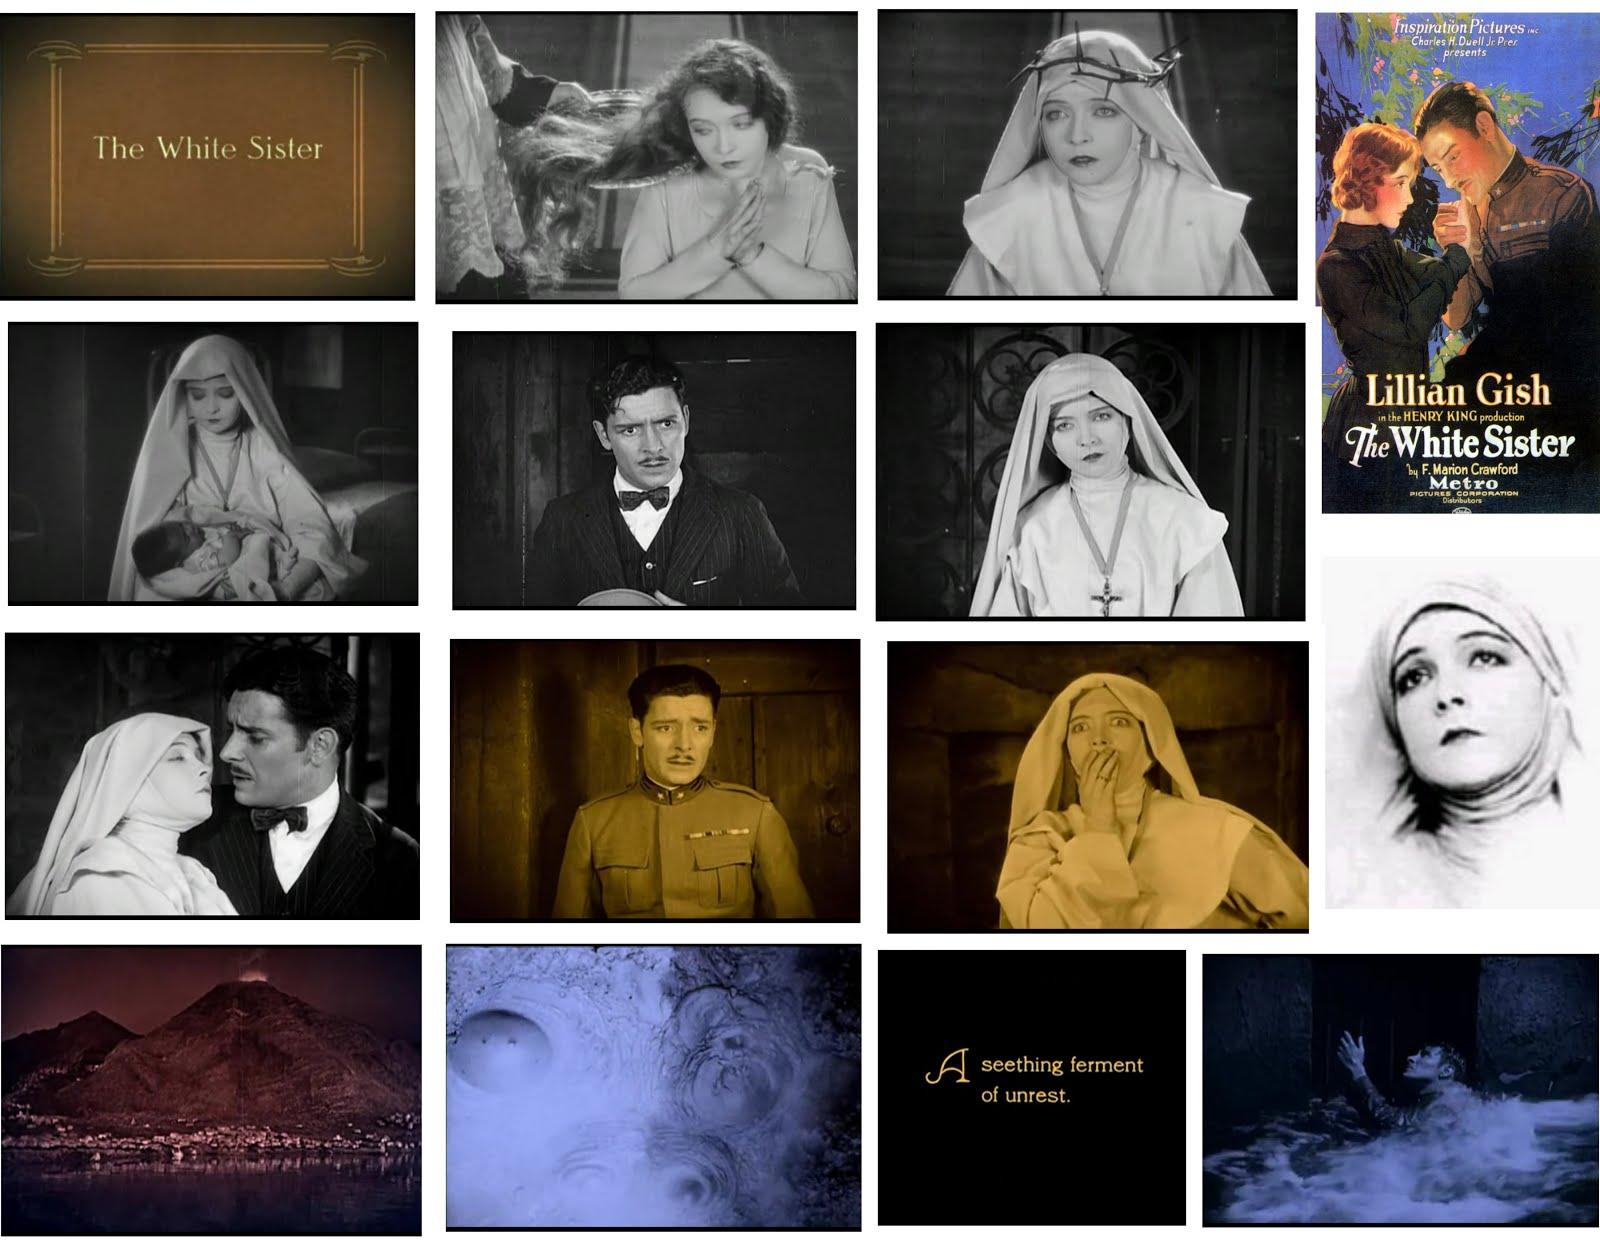 The White Sister (1923) DVD - restored, re-mastered